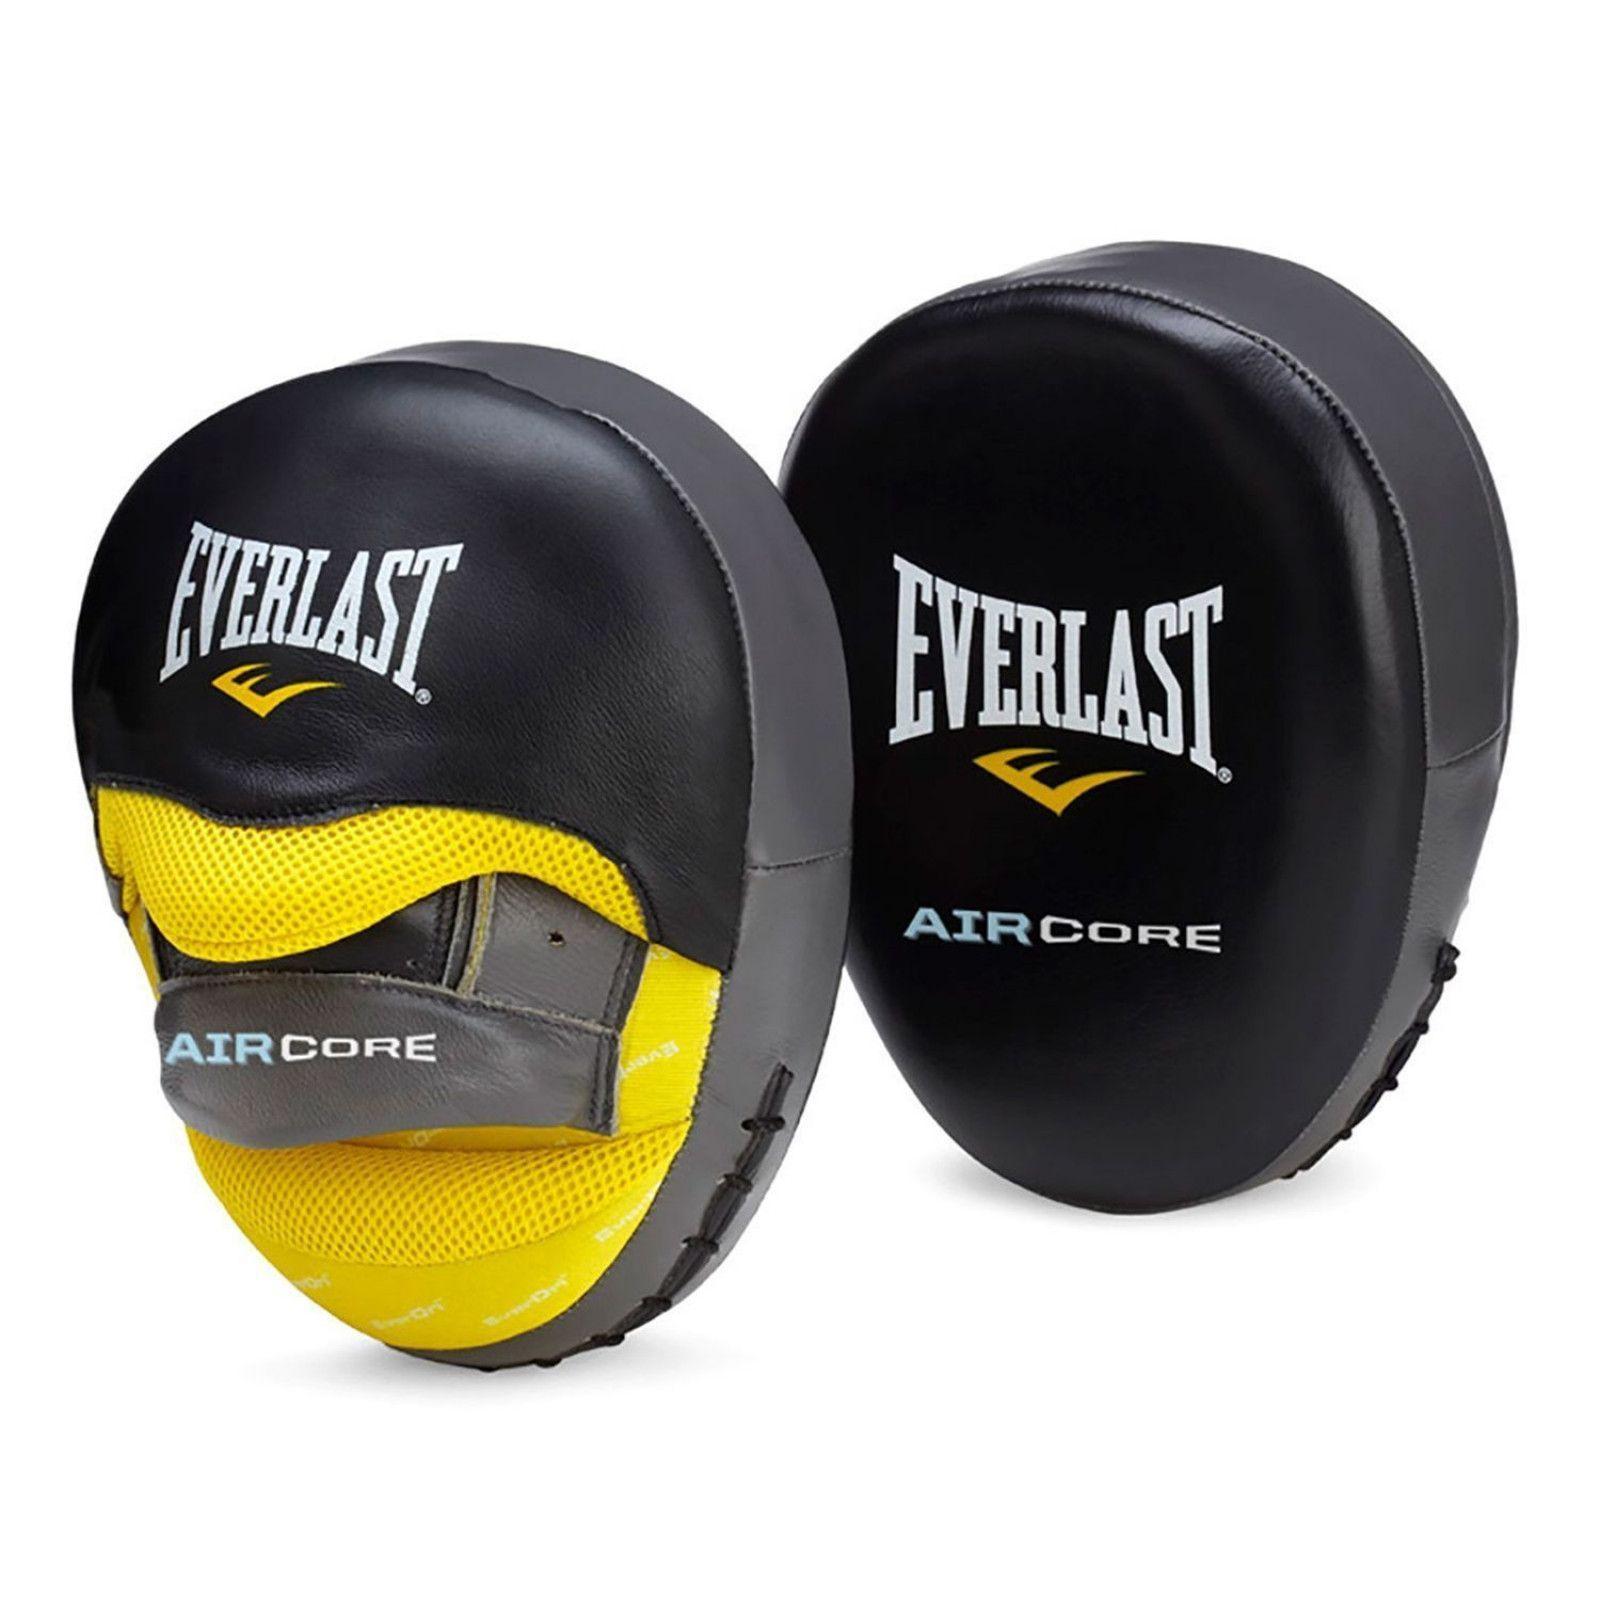 Лапы боксерские Everlast C3 PRO Aircore Punch Mitts,